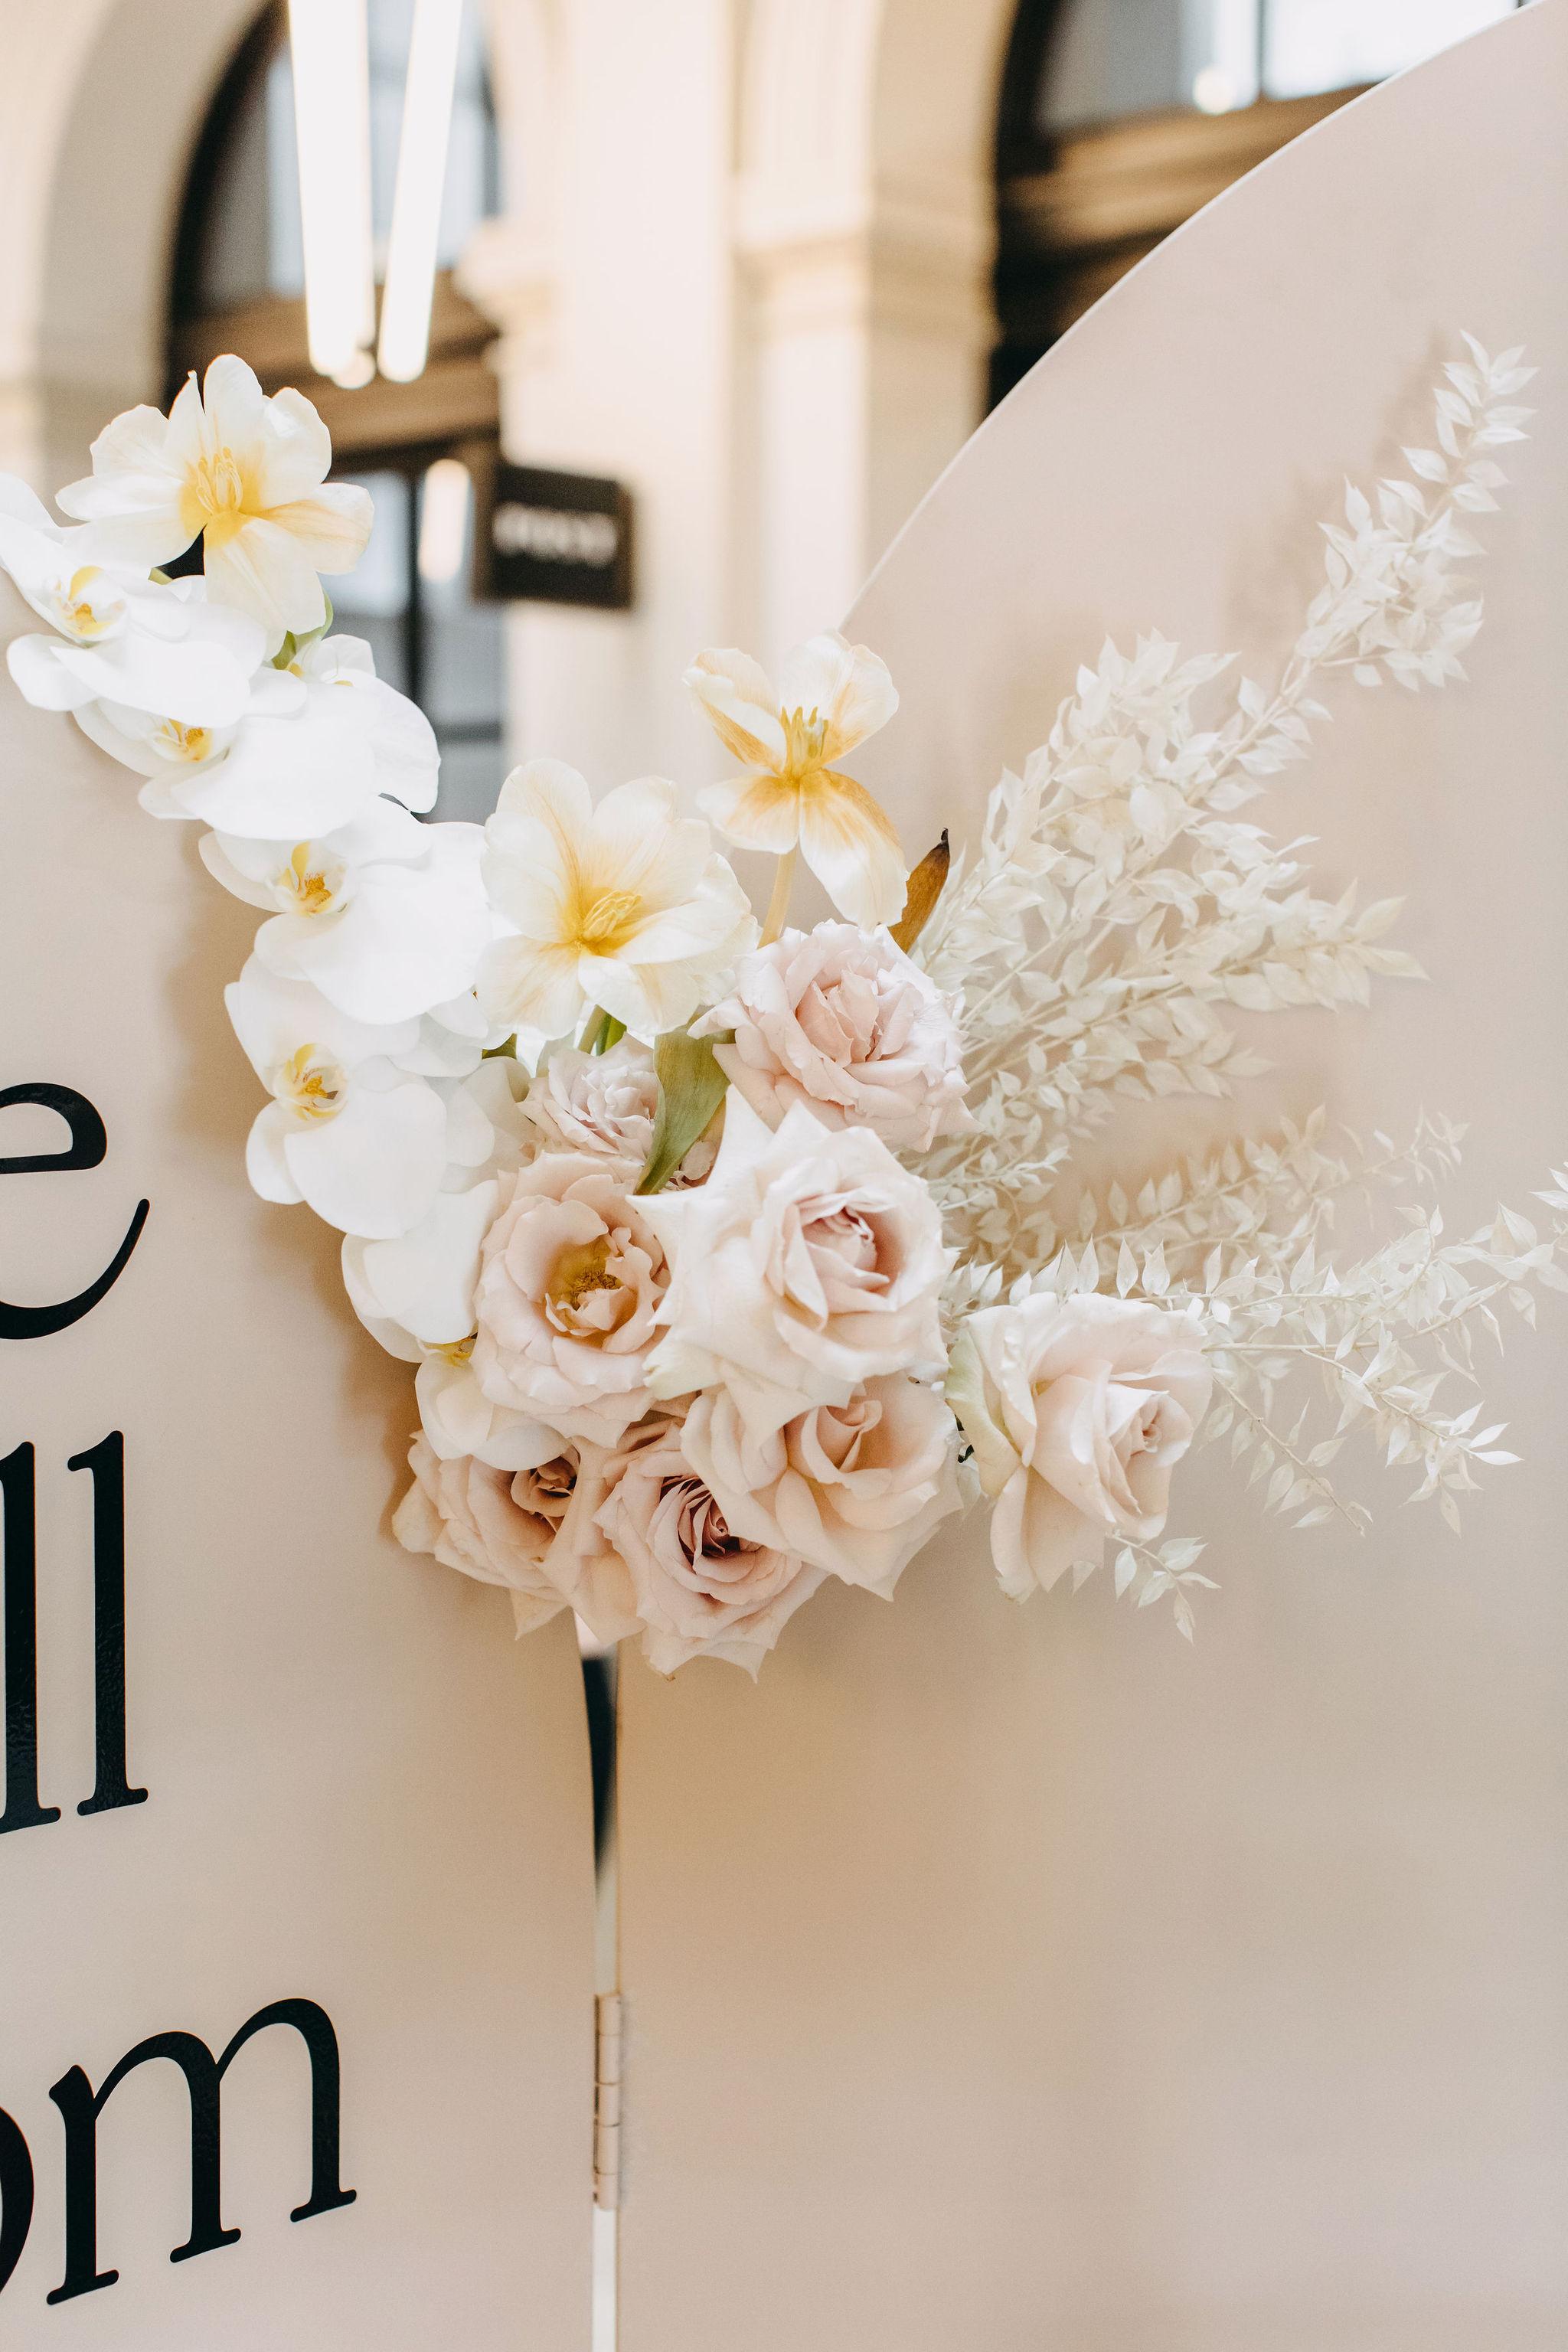 131-STATEBUILDINGS-WEDDINGOPENDAY-16FEB2020